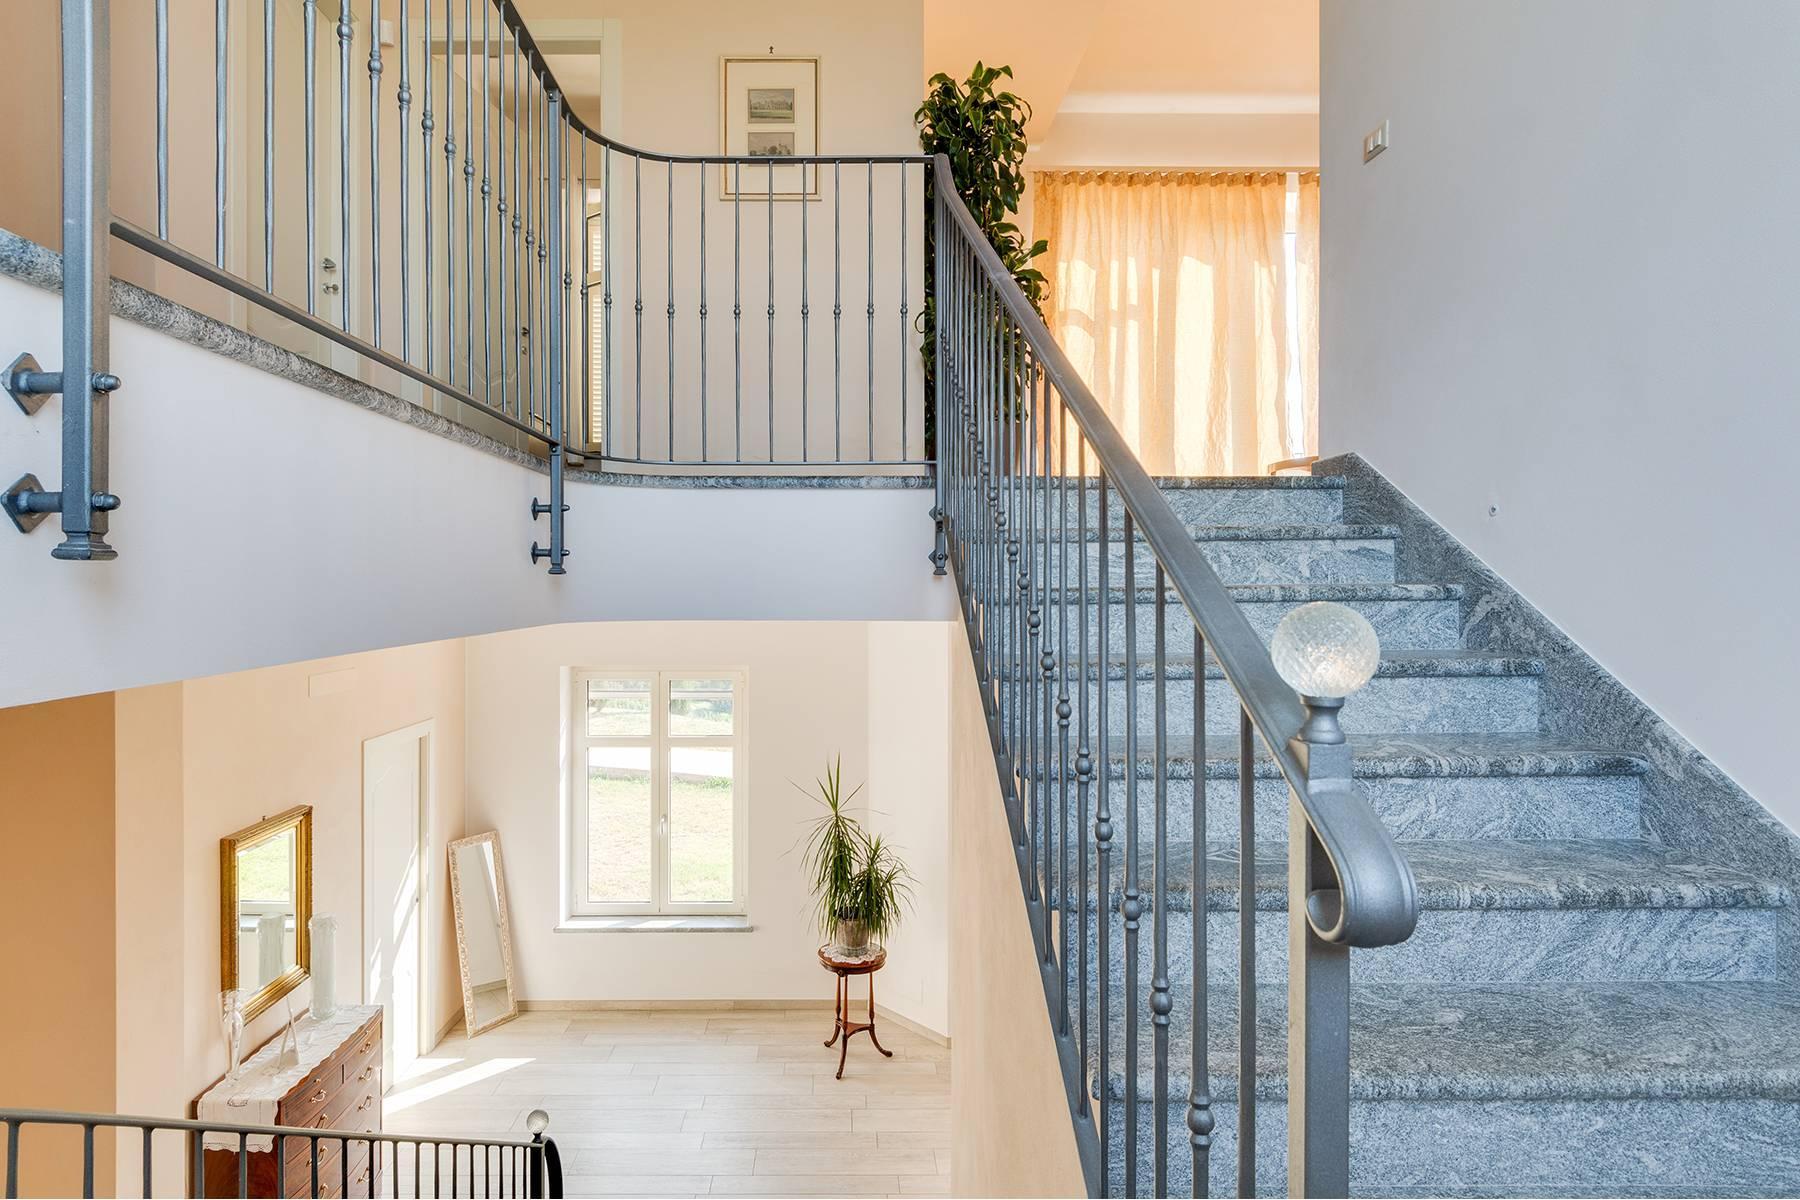 Moderne Villa im Herzen des Roero Gebiets - 11